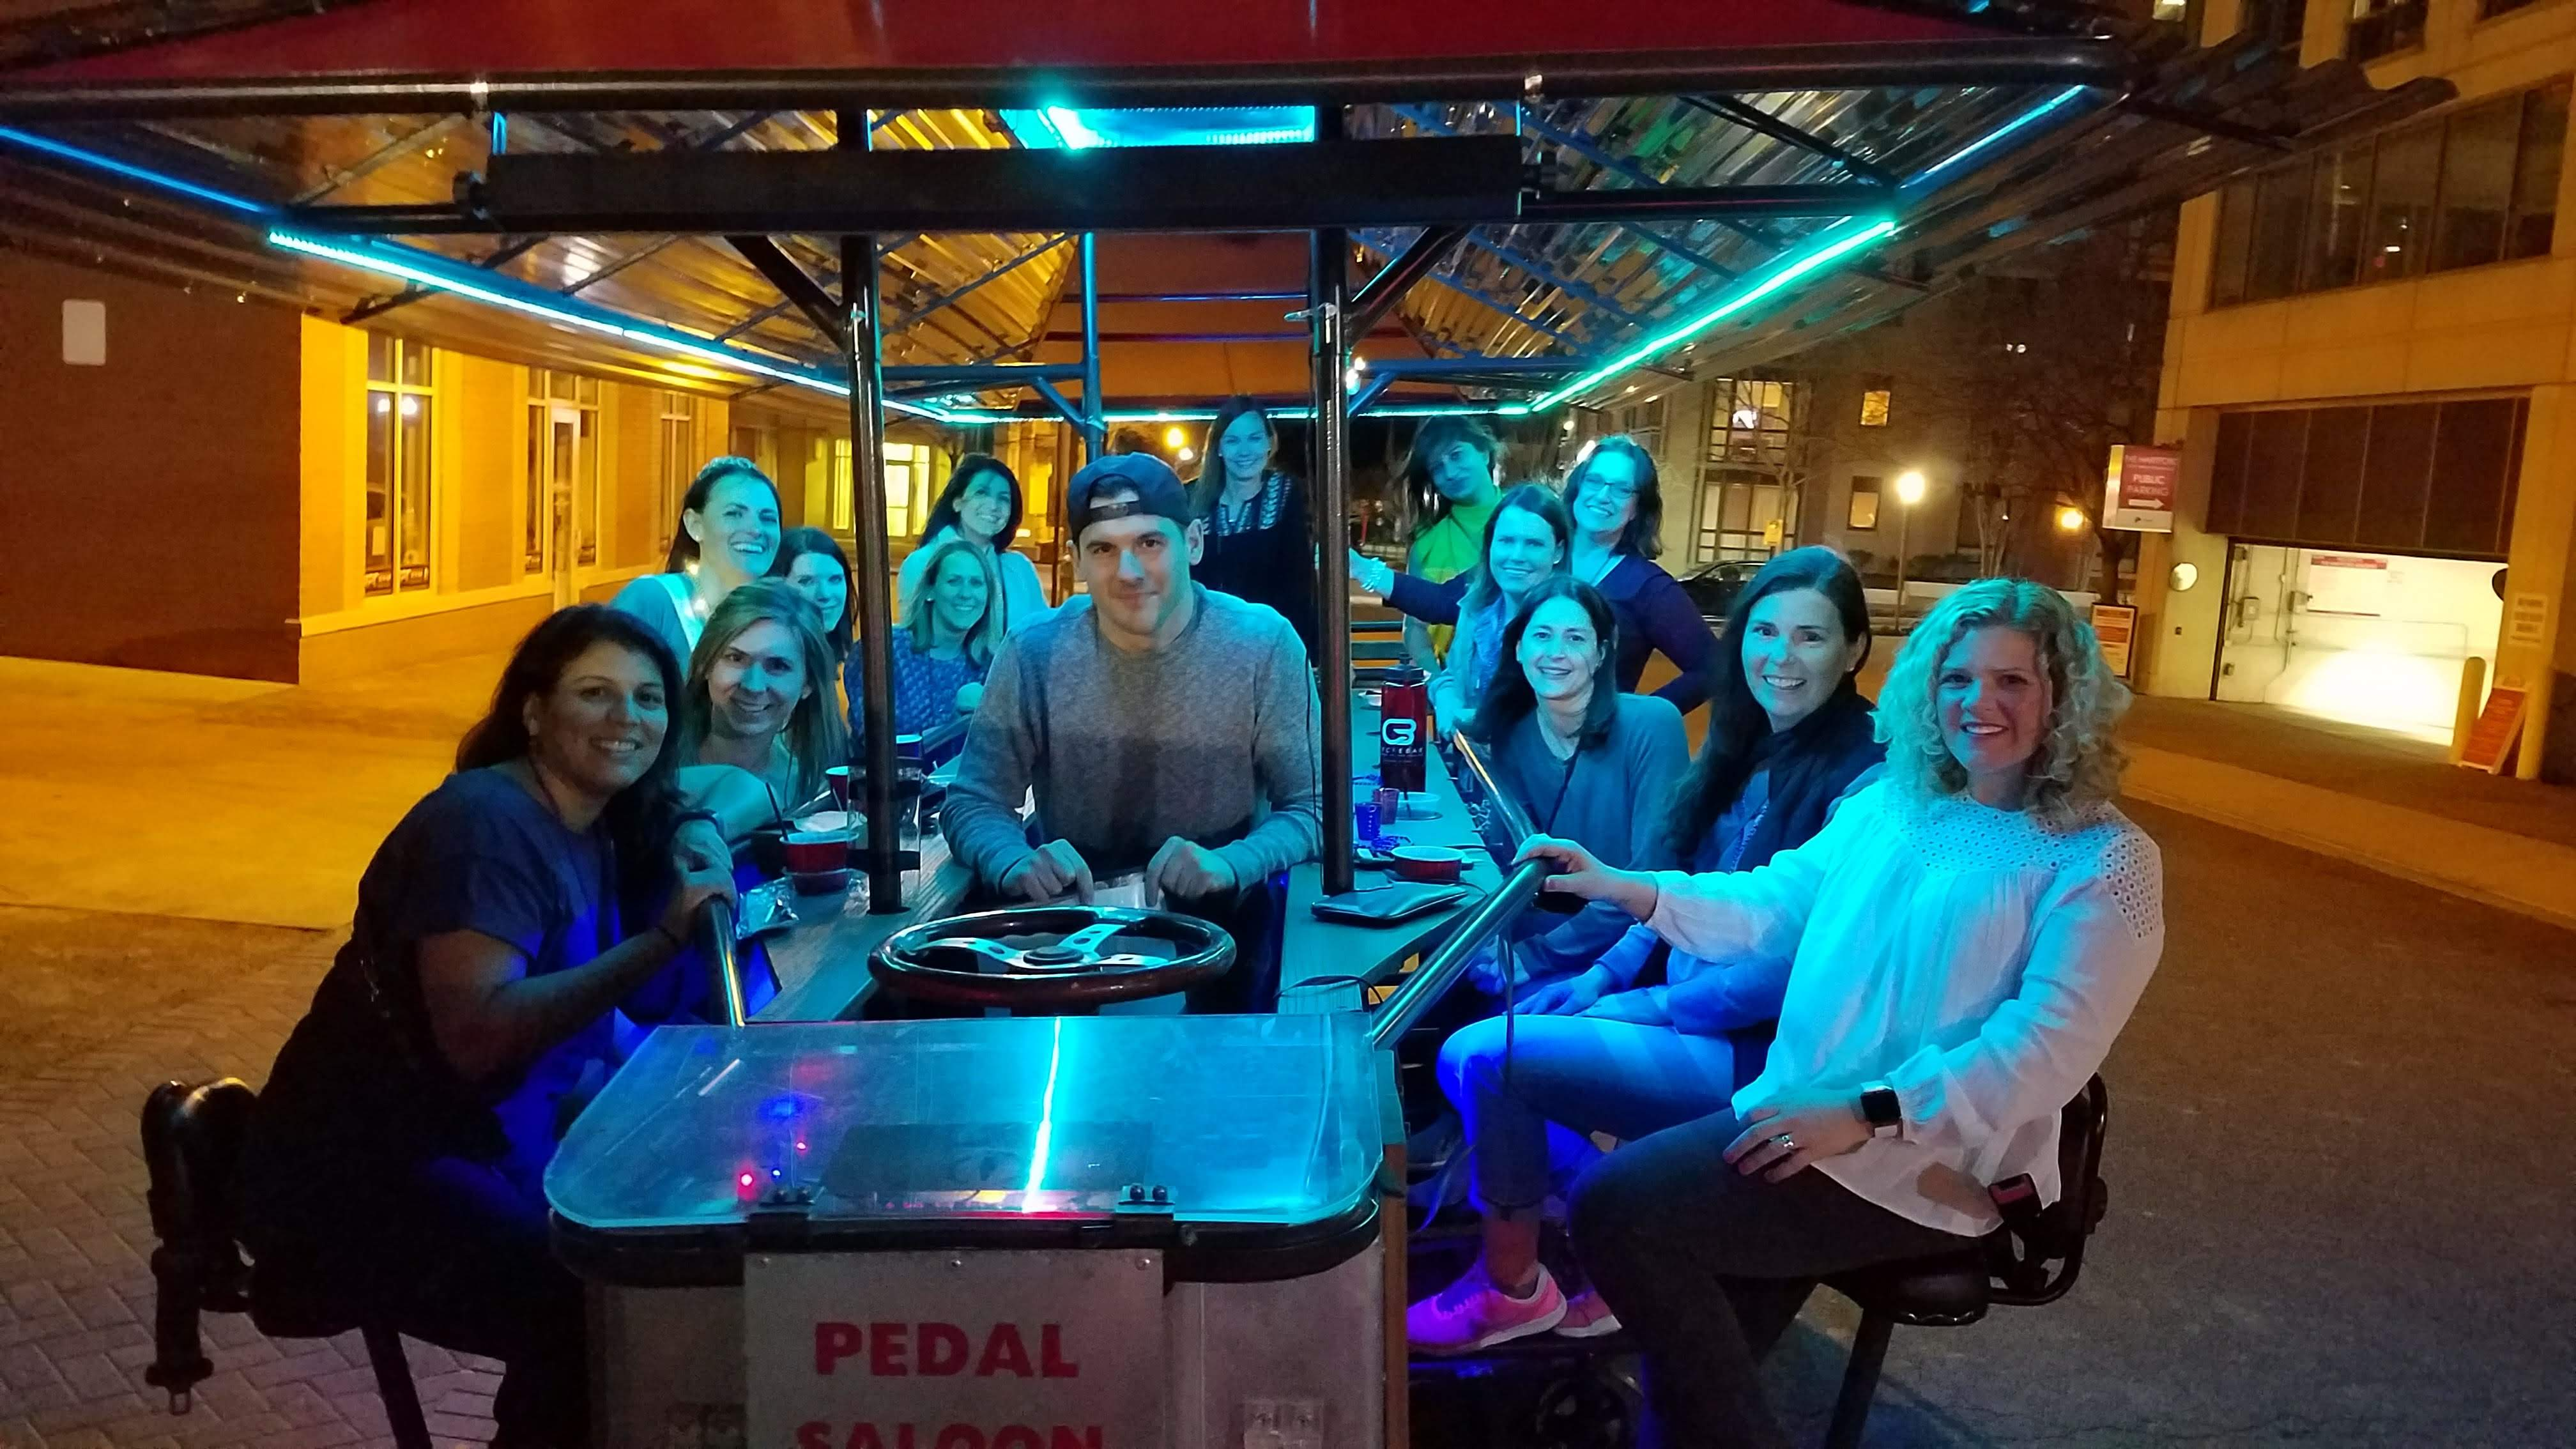 Pedal Saloon party tour group